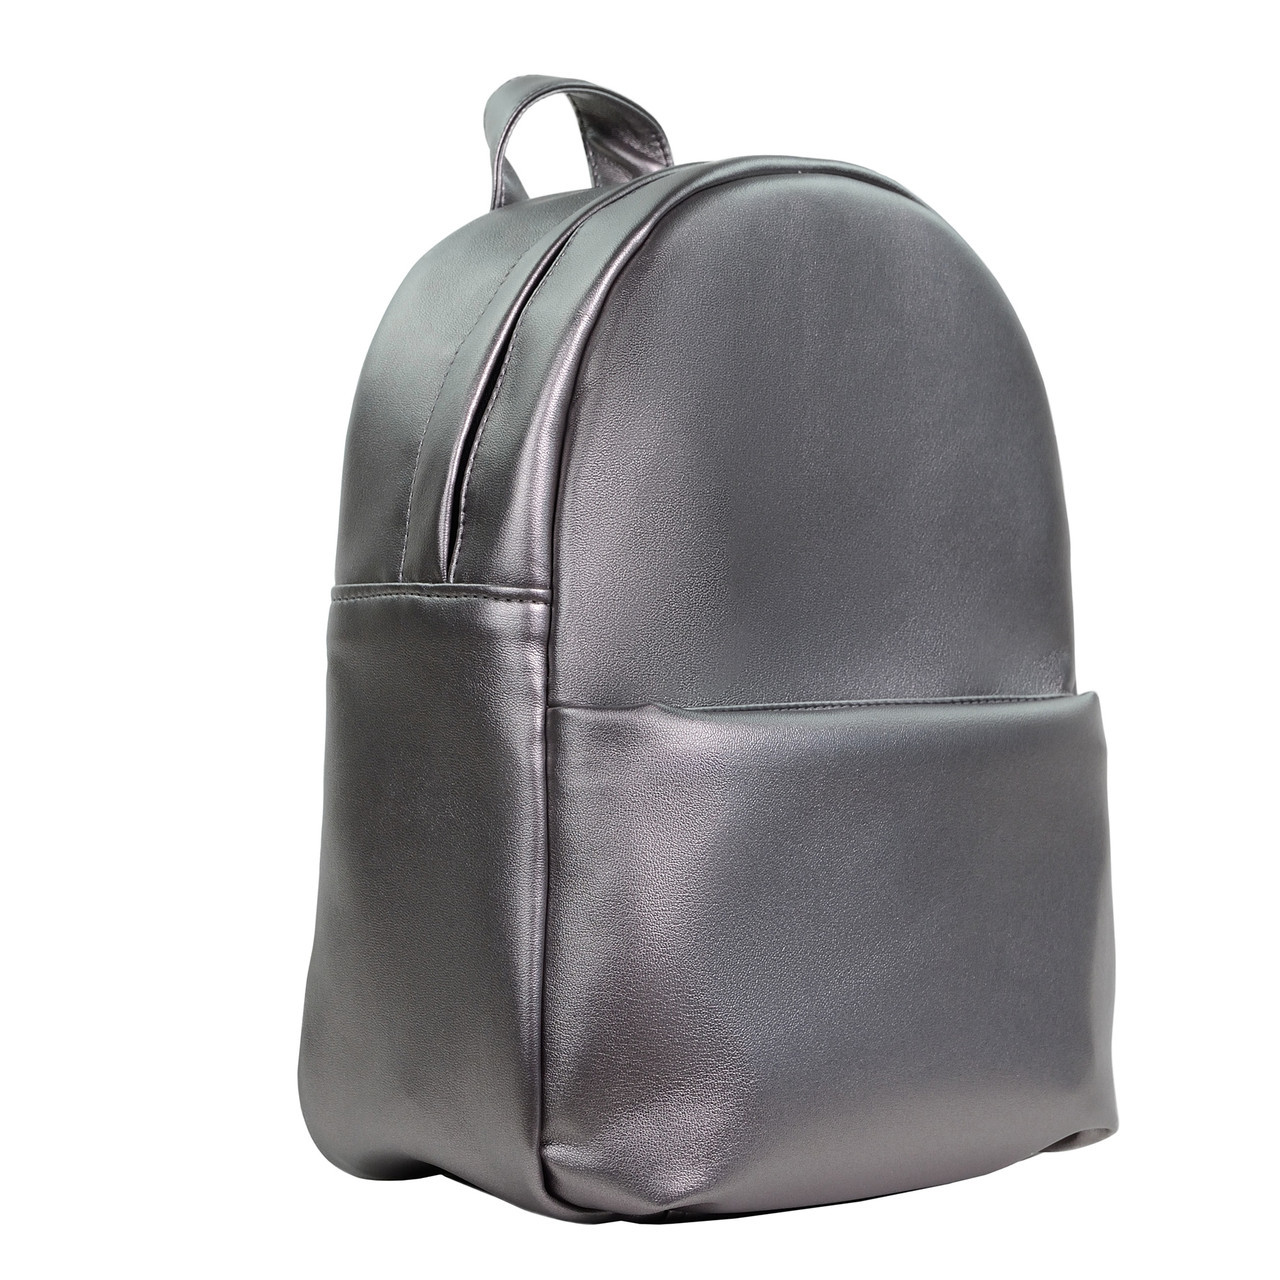 e87ca25b2b5b Женский рюкзак городской Брикс BSSP Sambag темное серебро (рюкзачок ...